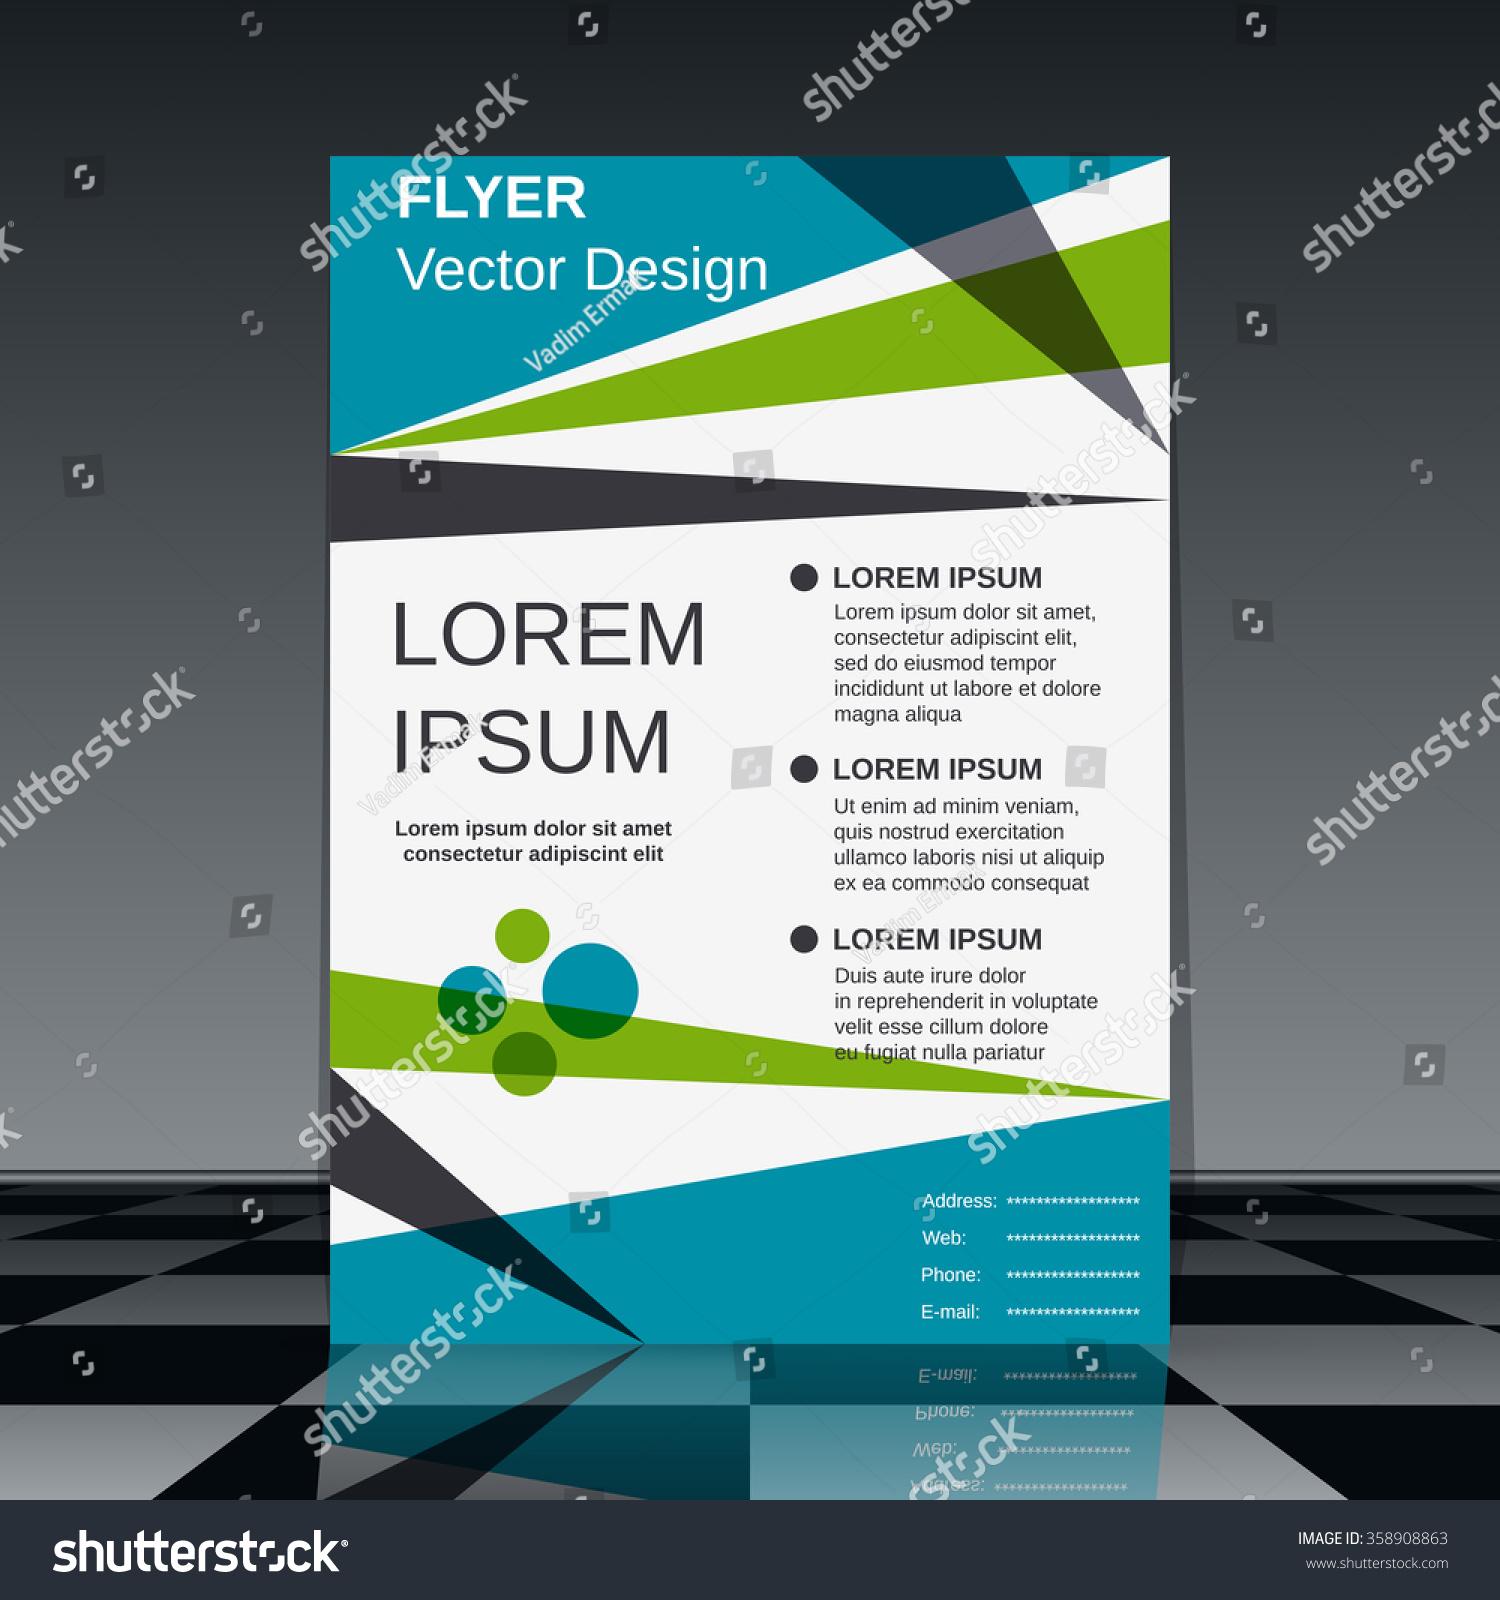 professional flyer design brochure mockup business stock vector professional flyer design brochure mockup business report magazine cover placard